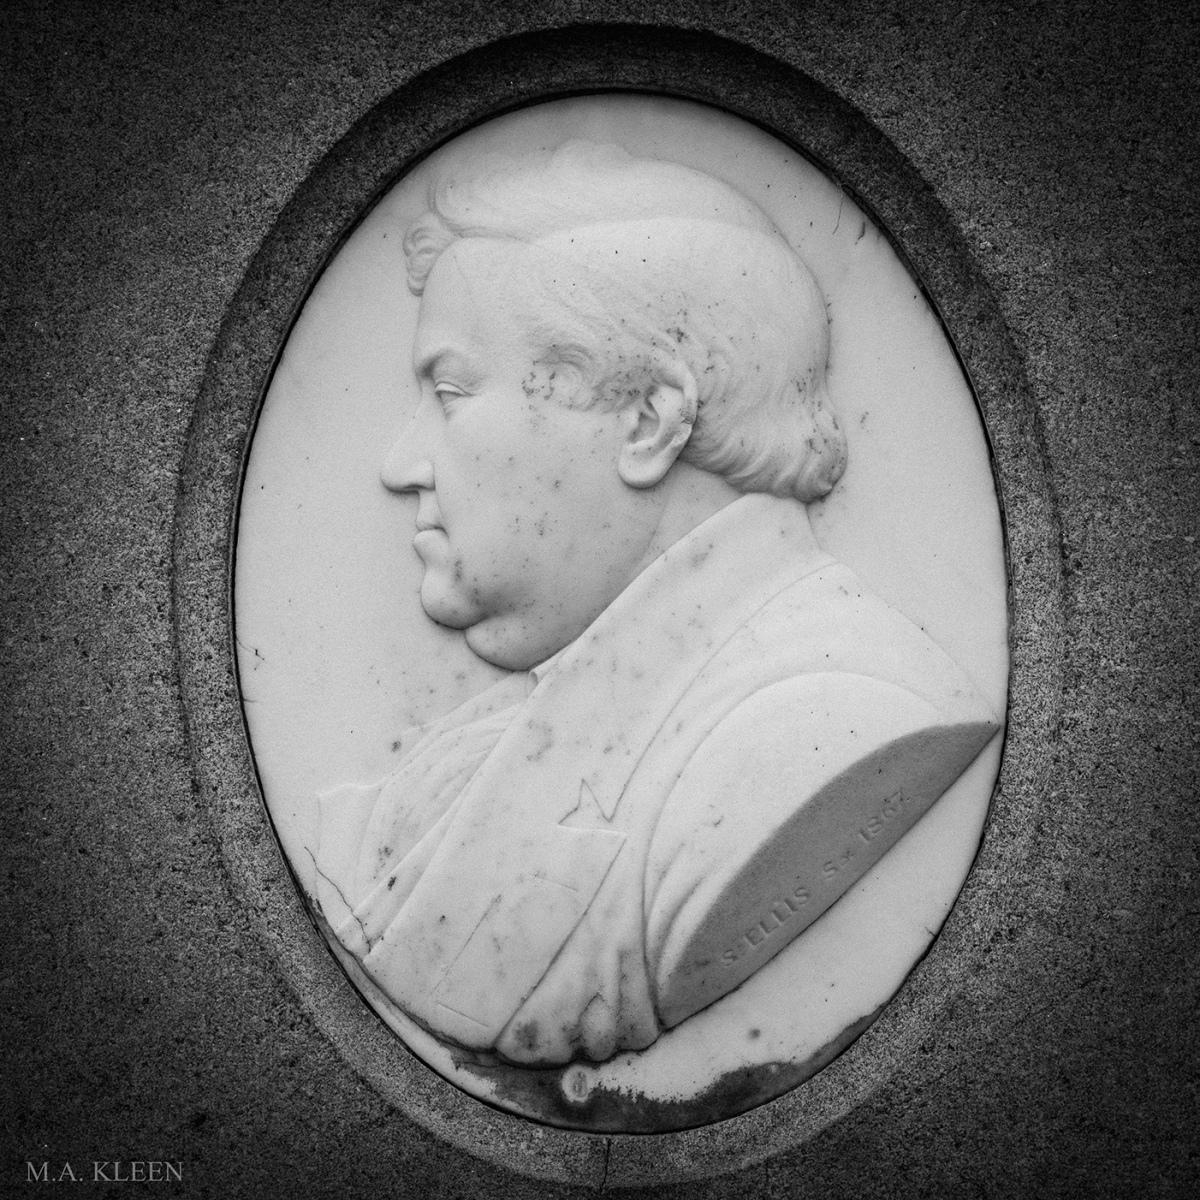 Relief bust of U.S. Senator Preston King (1806-1865) in Ogdensburg/Riverside Cemetery on State Route 812 in Ogdensburg, New York.